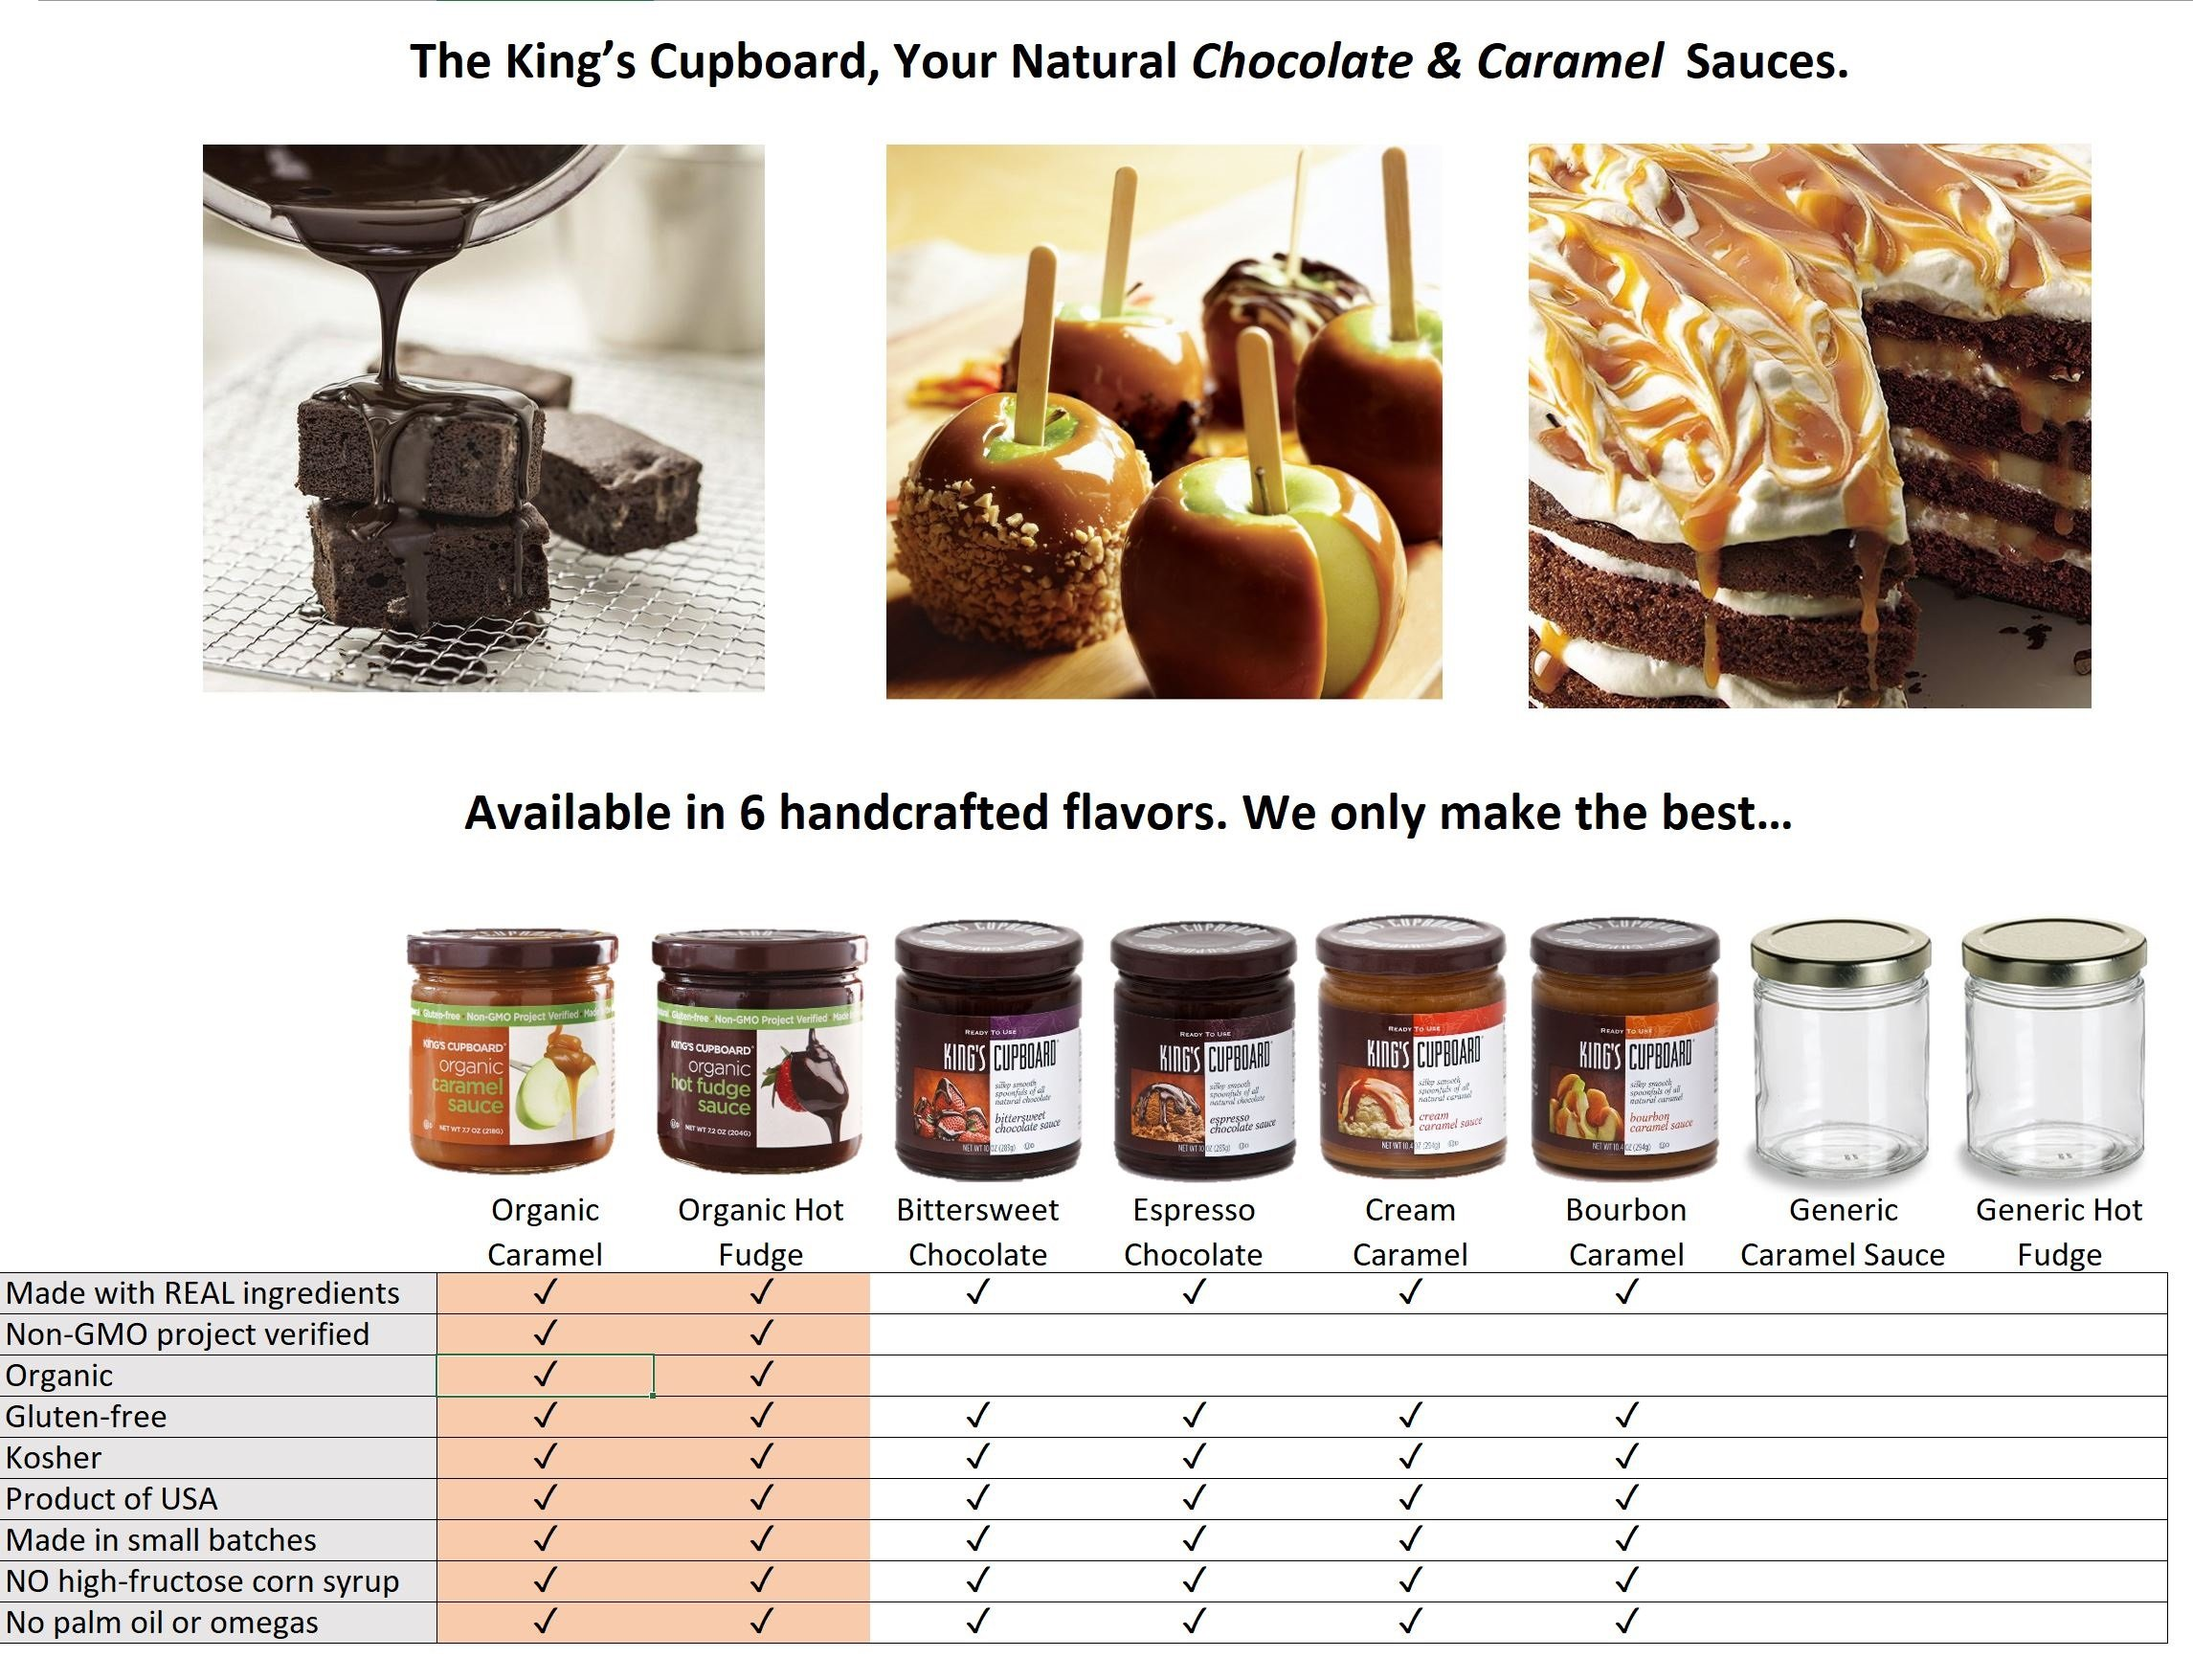 The King's Cupboard Original Organic Sampler Gift Set of Hot Fudge & Caramel Sauce by The King's Cupboard (Image #2)